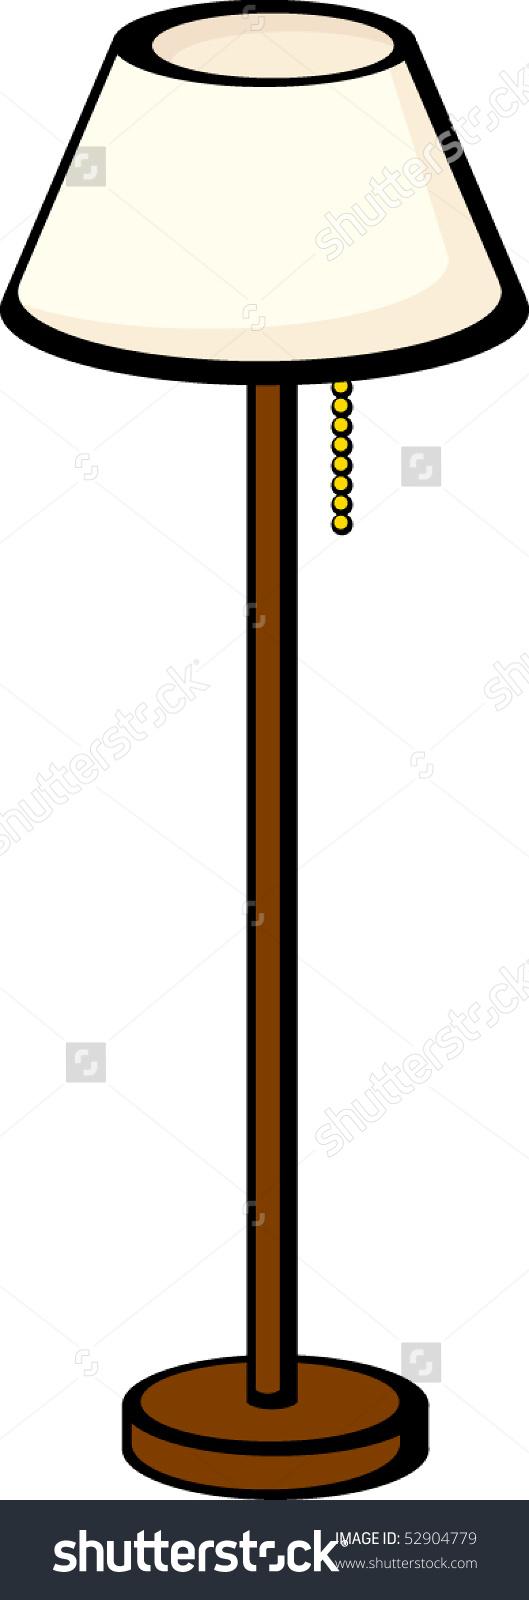 529x1600 Standard Lamp Clipart